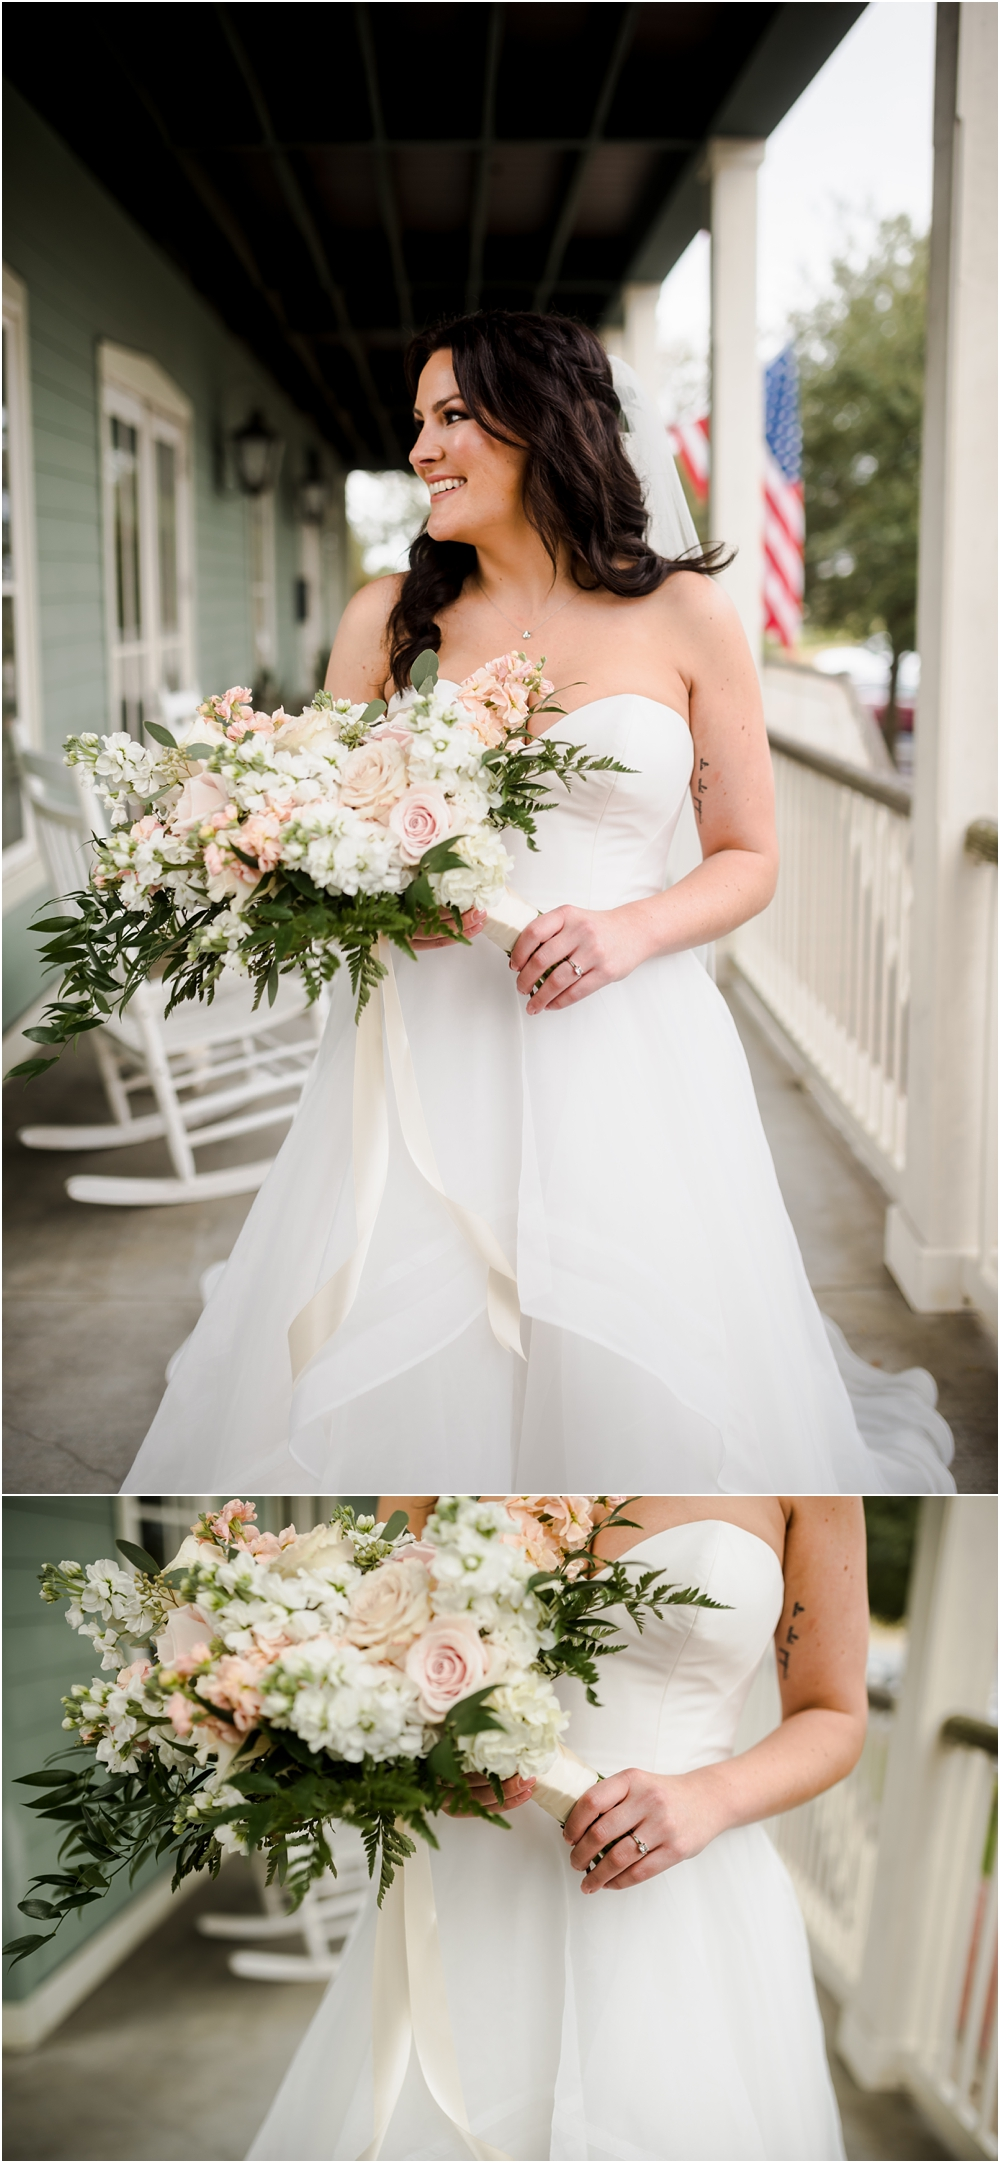 pensacola-wedding-photographer-kiersten-grant-25.jpg